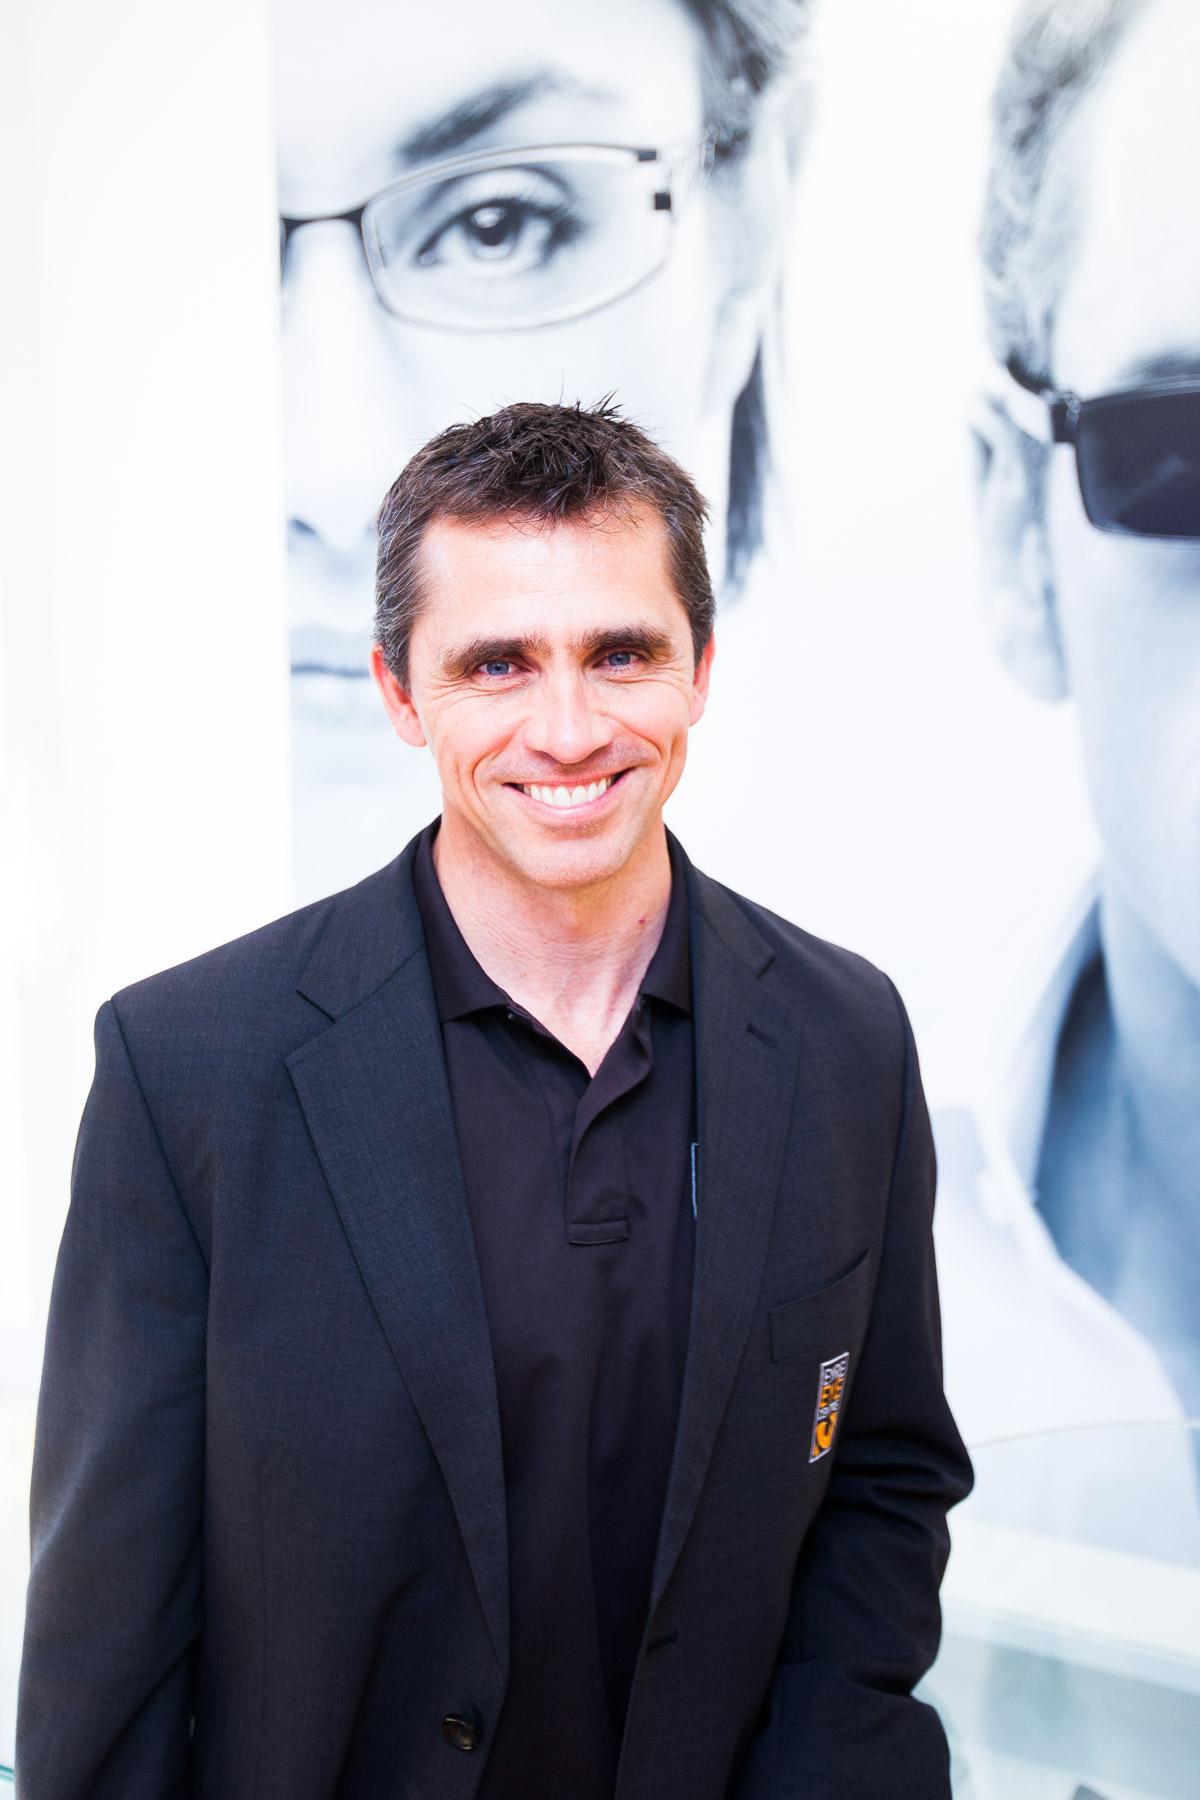 Craig Farmer, Optometrist at Eyre Eye Centre